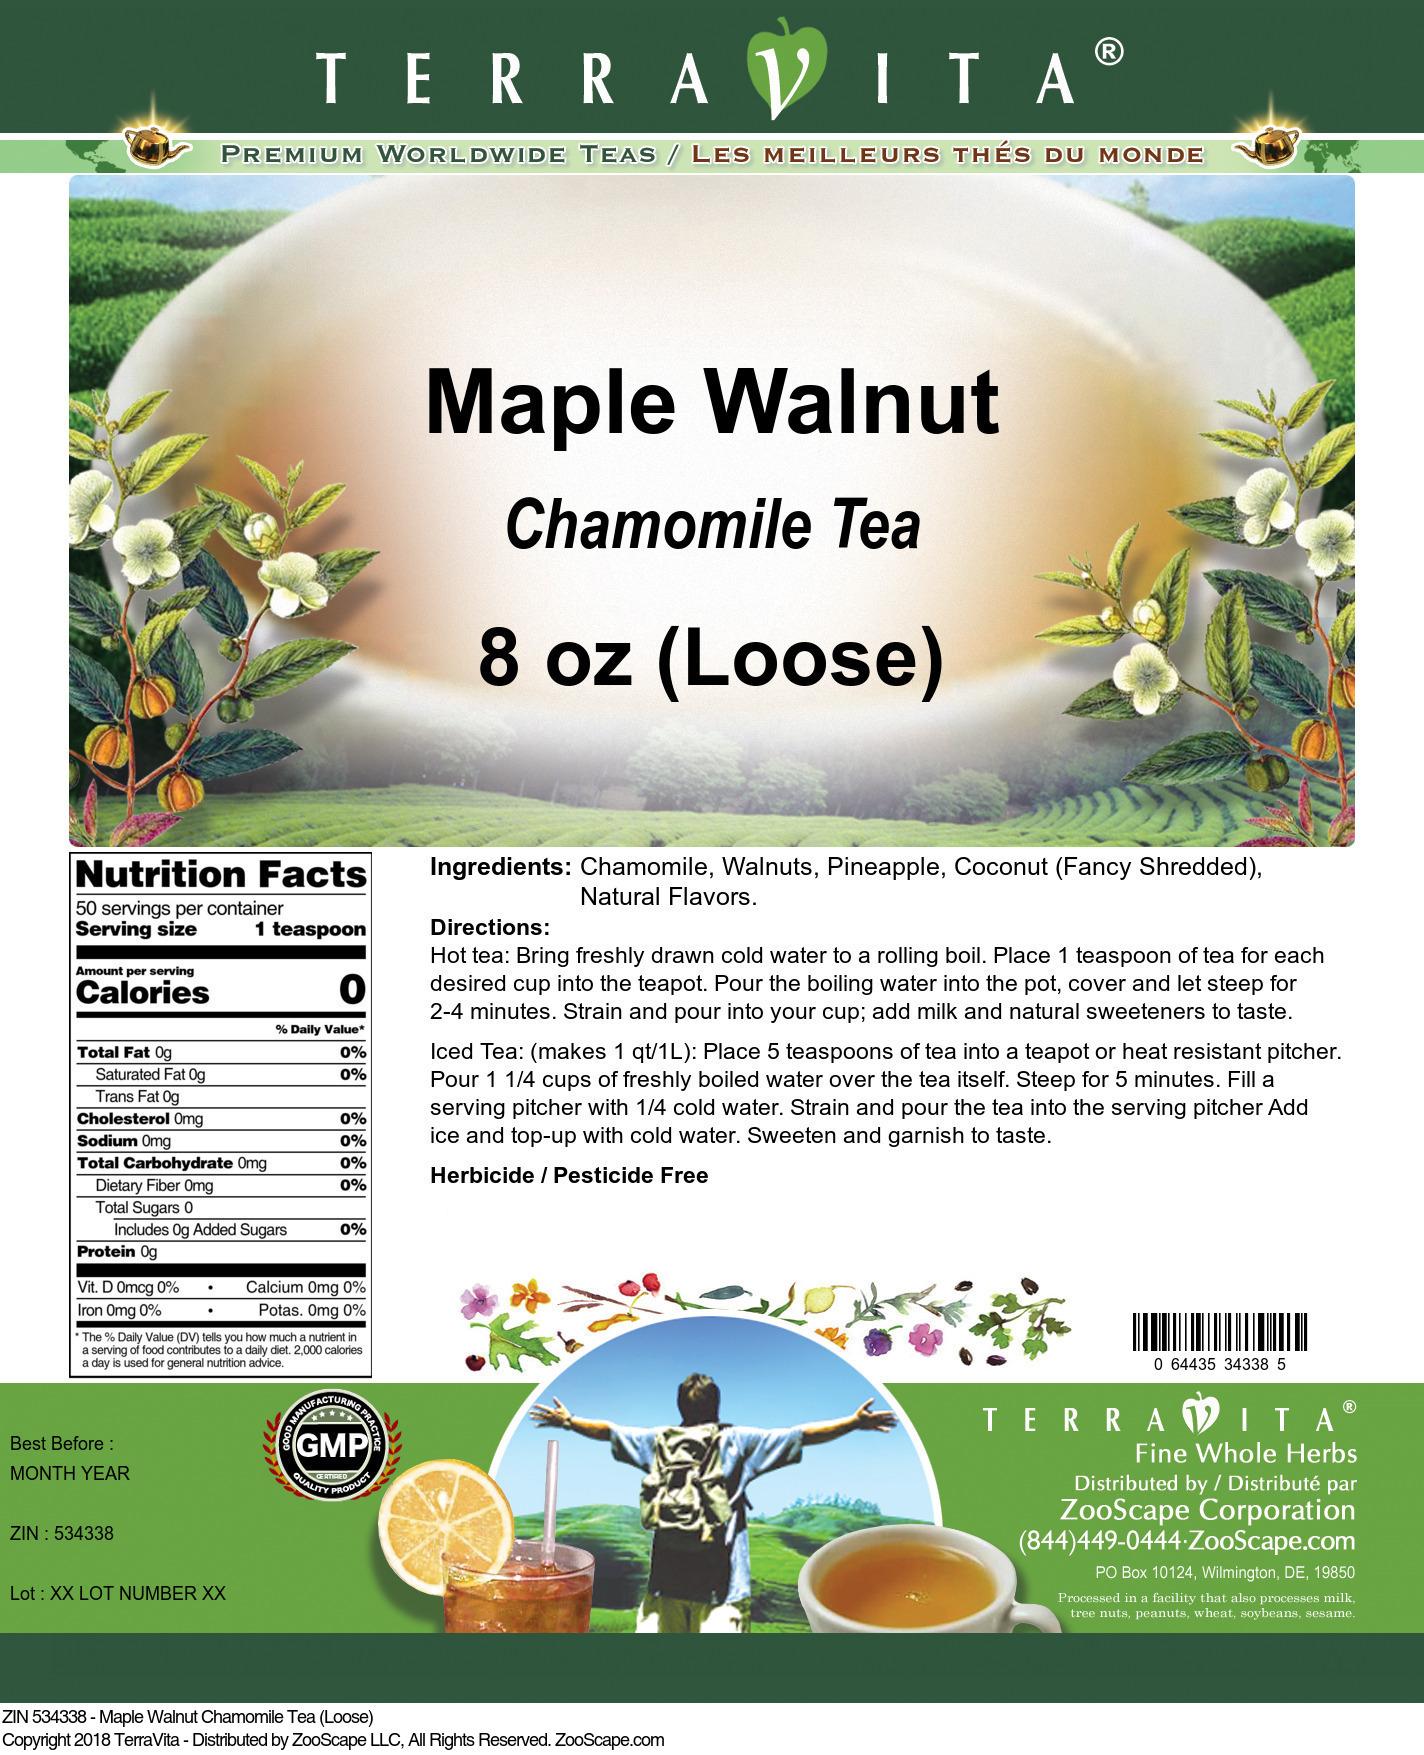 Maple Walnut Chamomile Tea